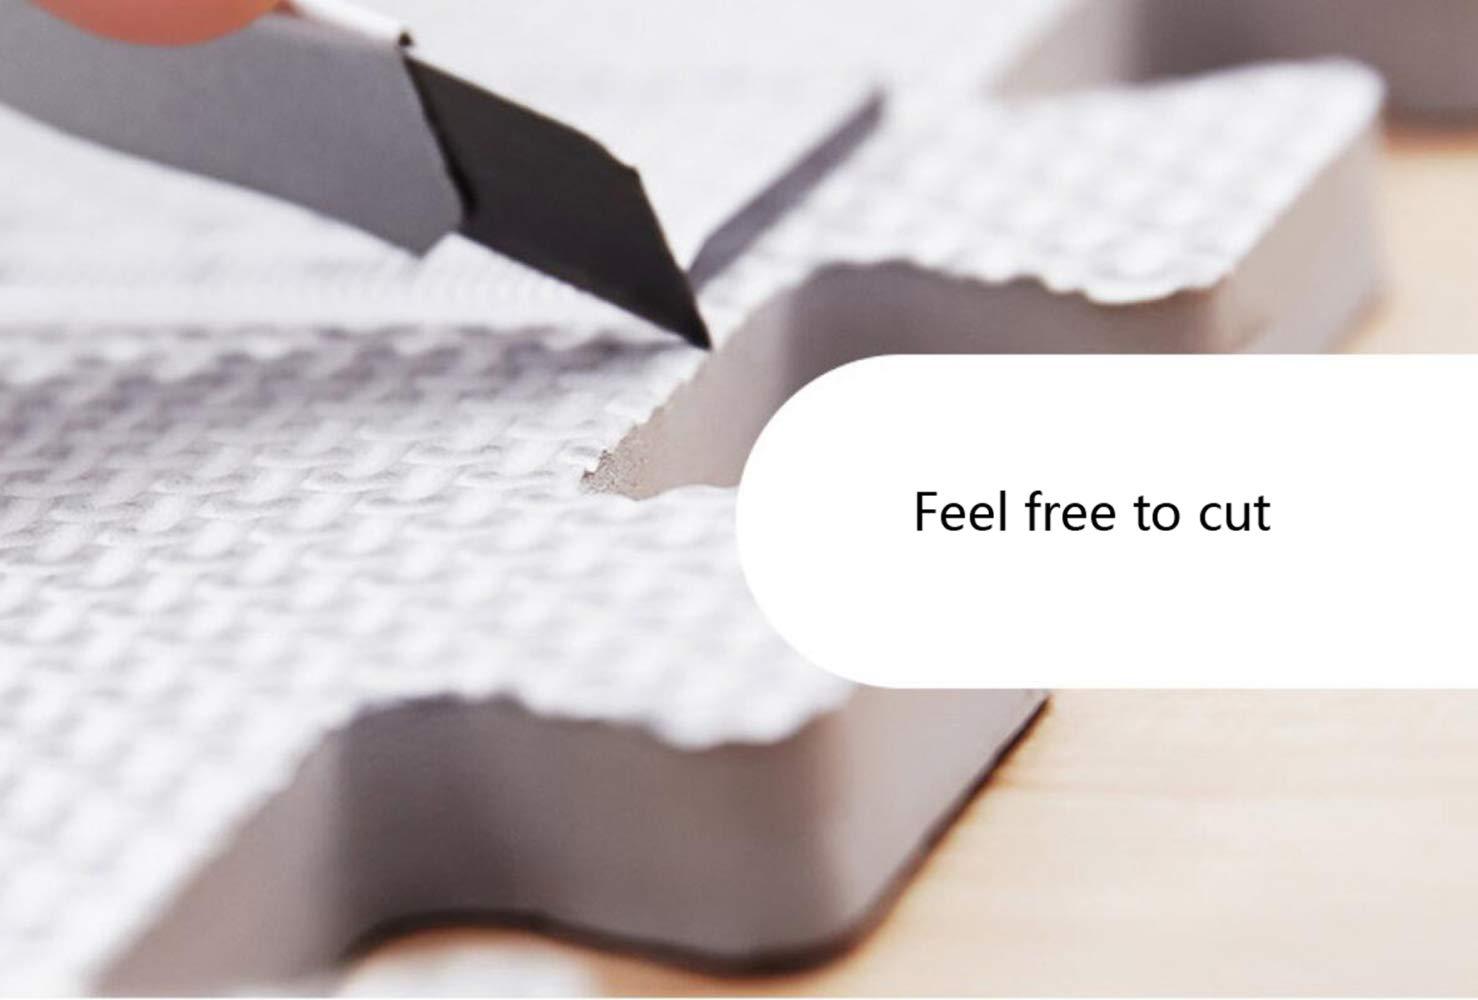 QXMEI Stitching High Elastic Foam Pad Puzzle Mat Children's Mat Crawling Mat Baby Bedroom Slip,Beige+Gray by QXMEI (Image #4)